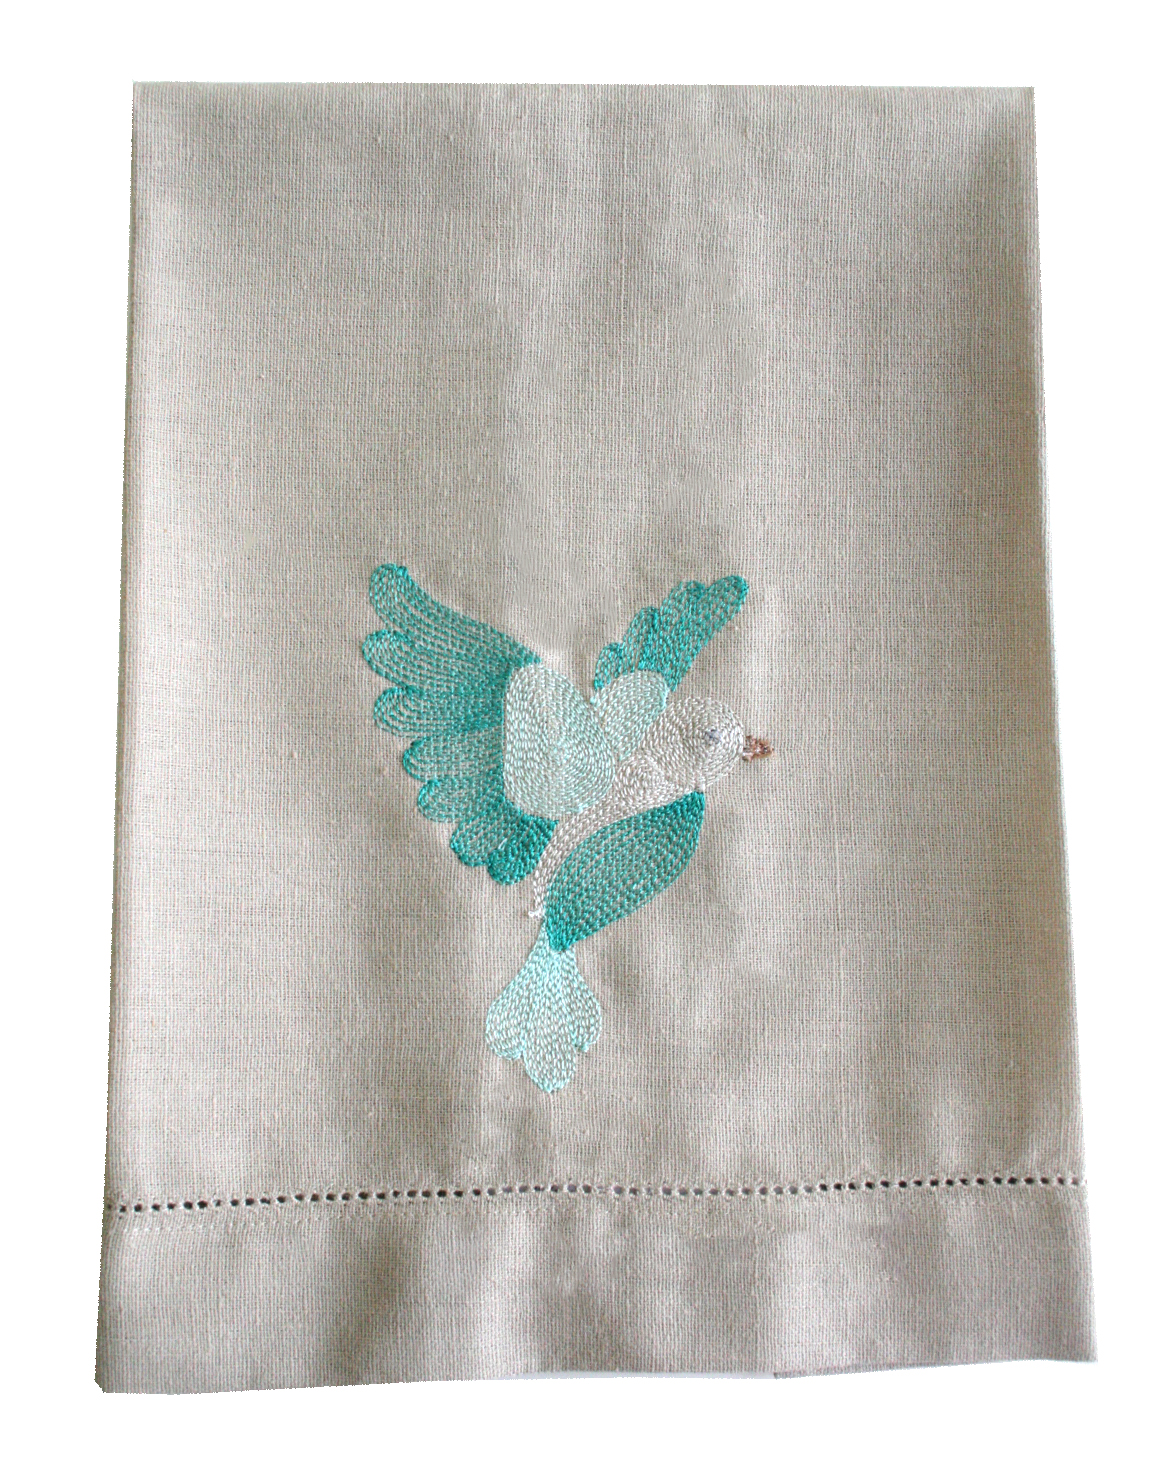 Lavabo Blue Bird - Chino